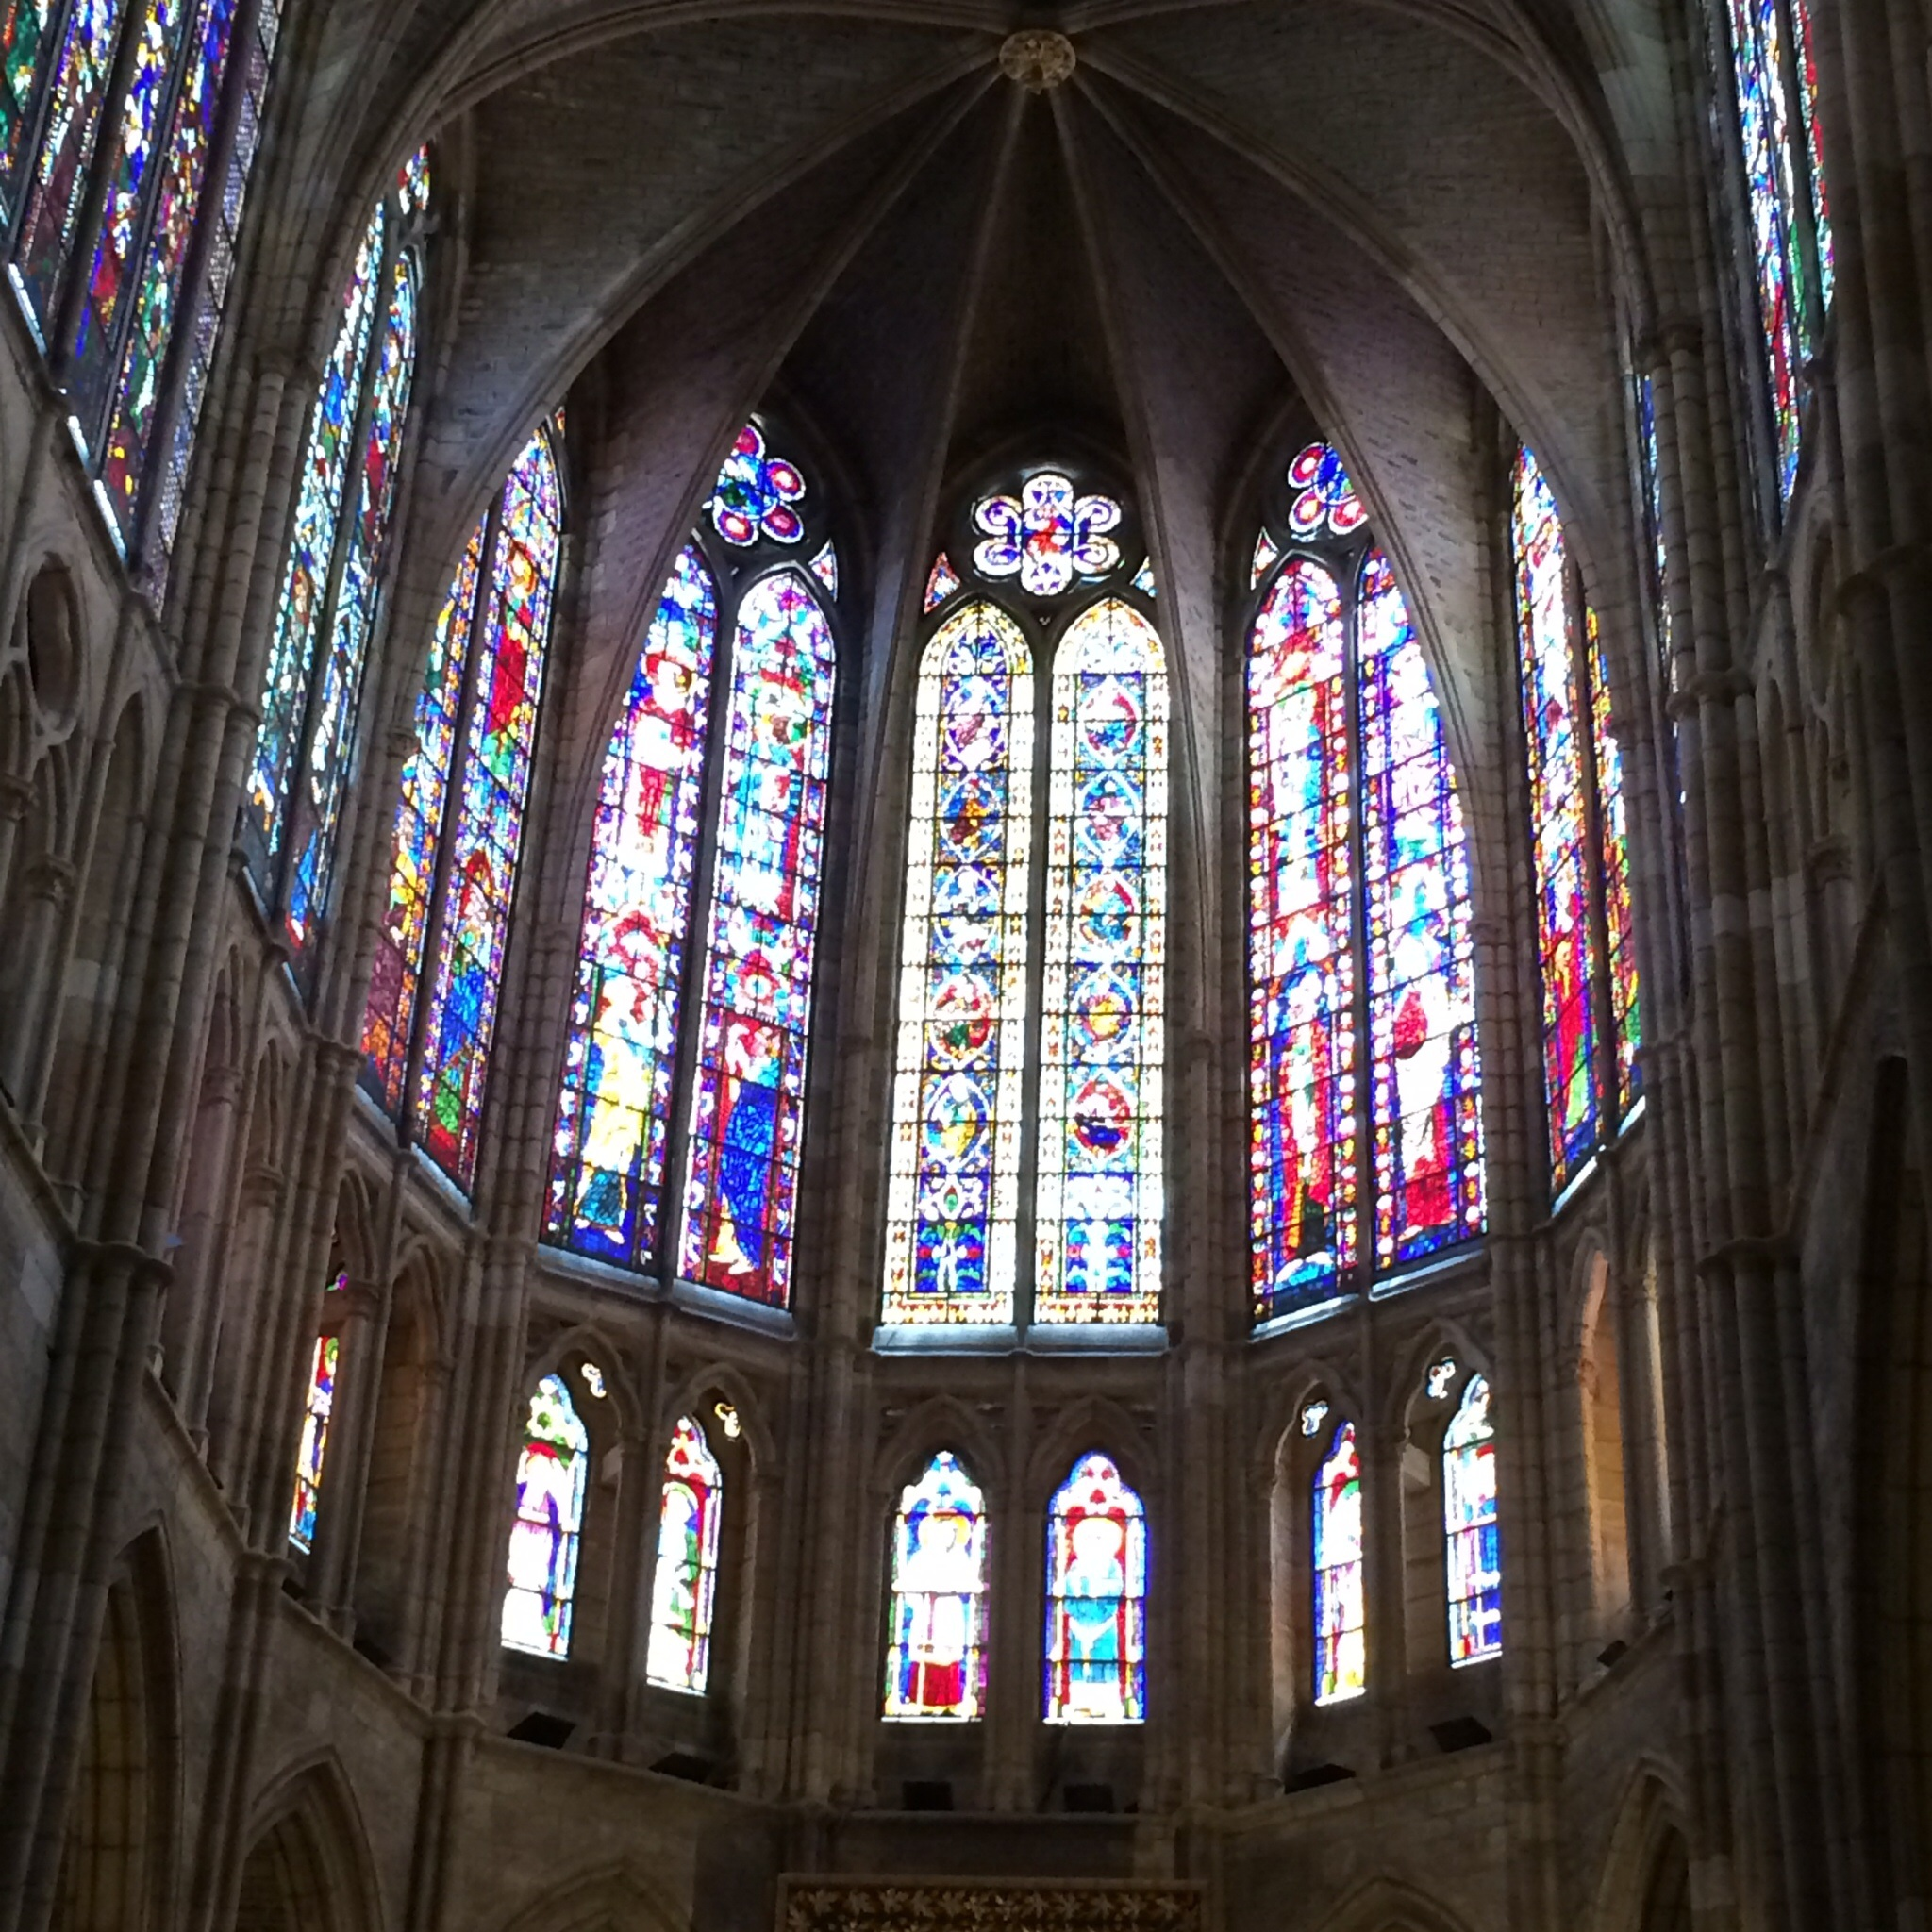 This is one interior shot of the Catedral de Santa Maria de Leon.